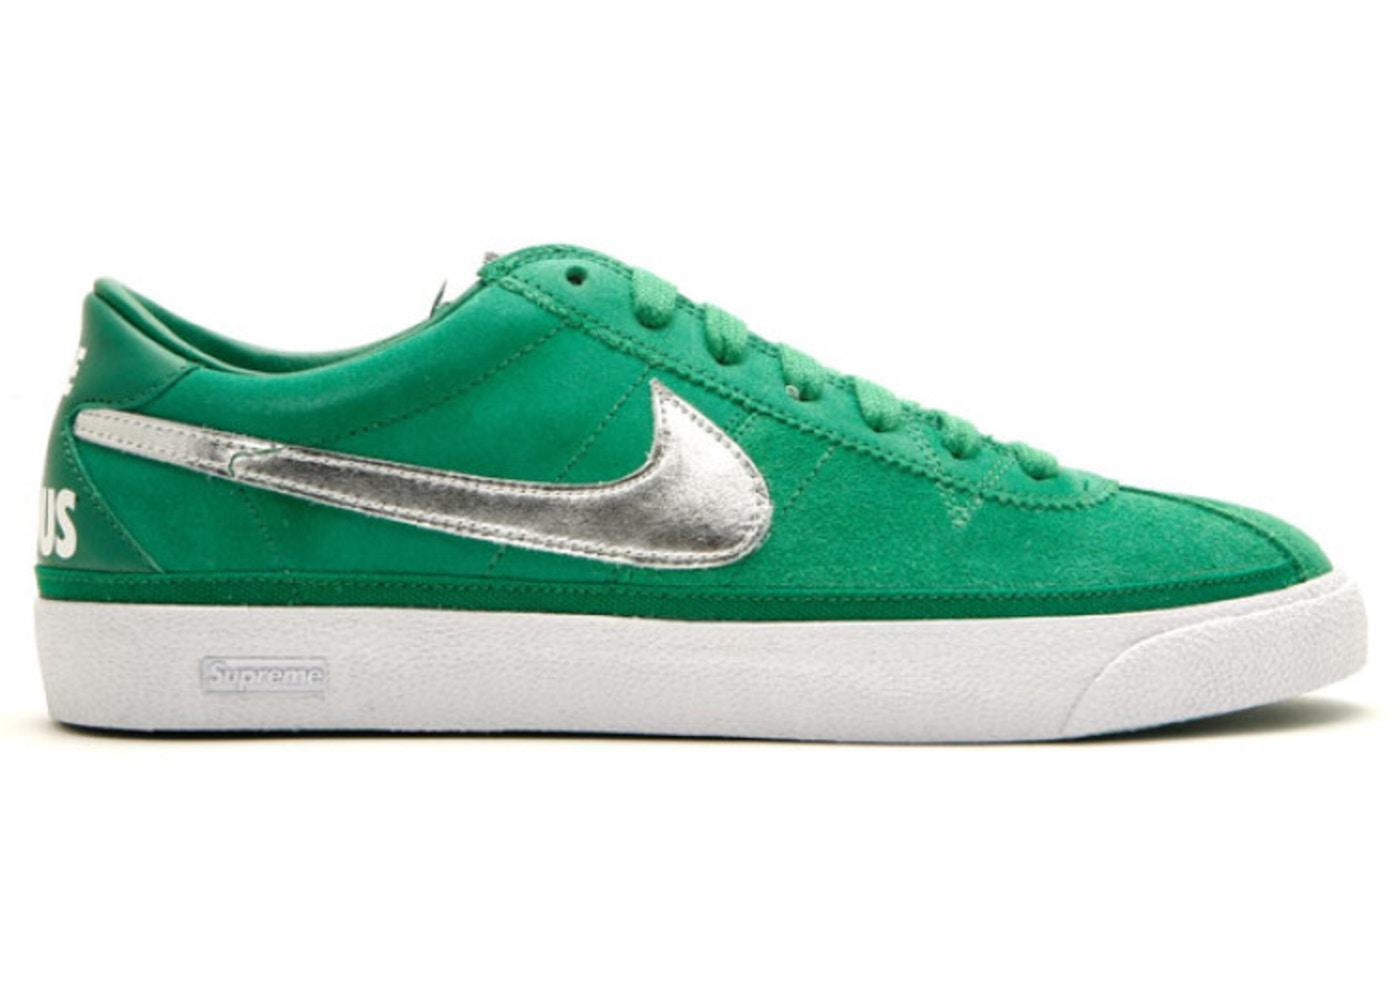 Nike SB Bruin Supreme Pine Green Sneakers (Pine Green/White)